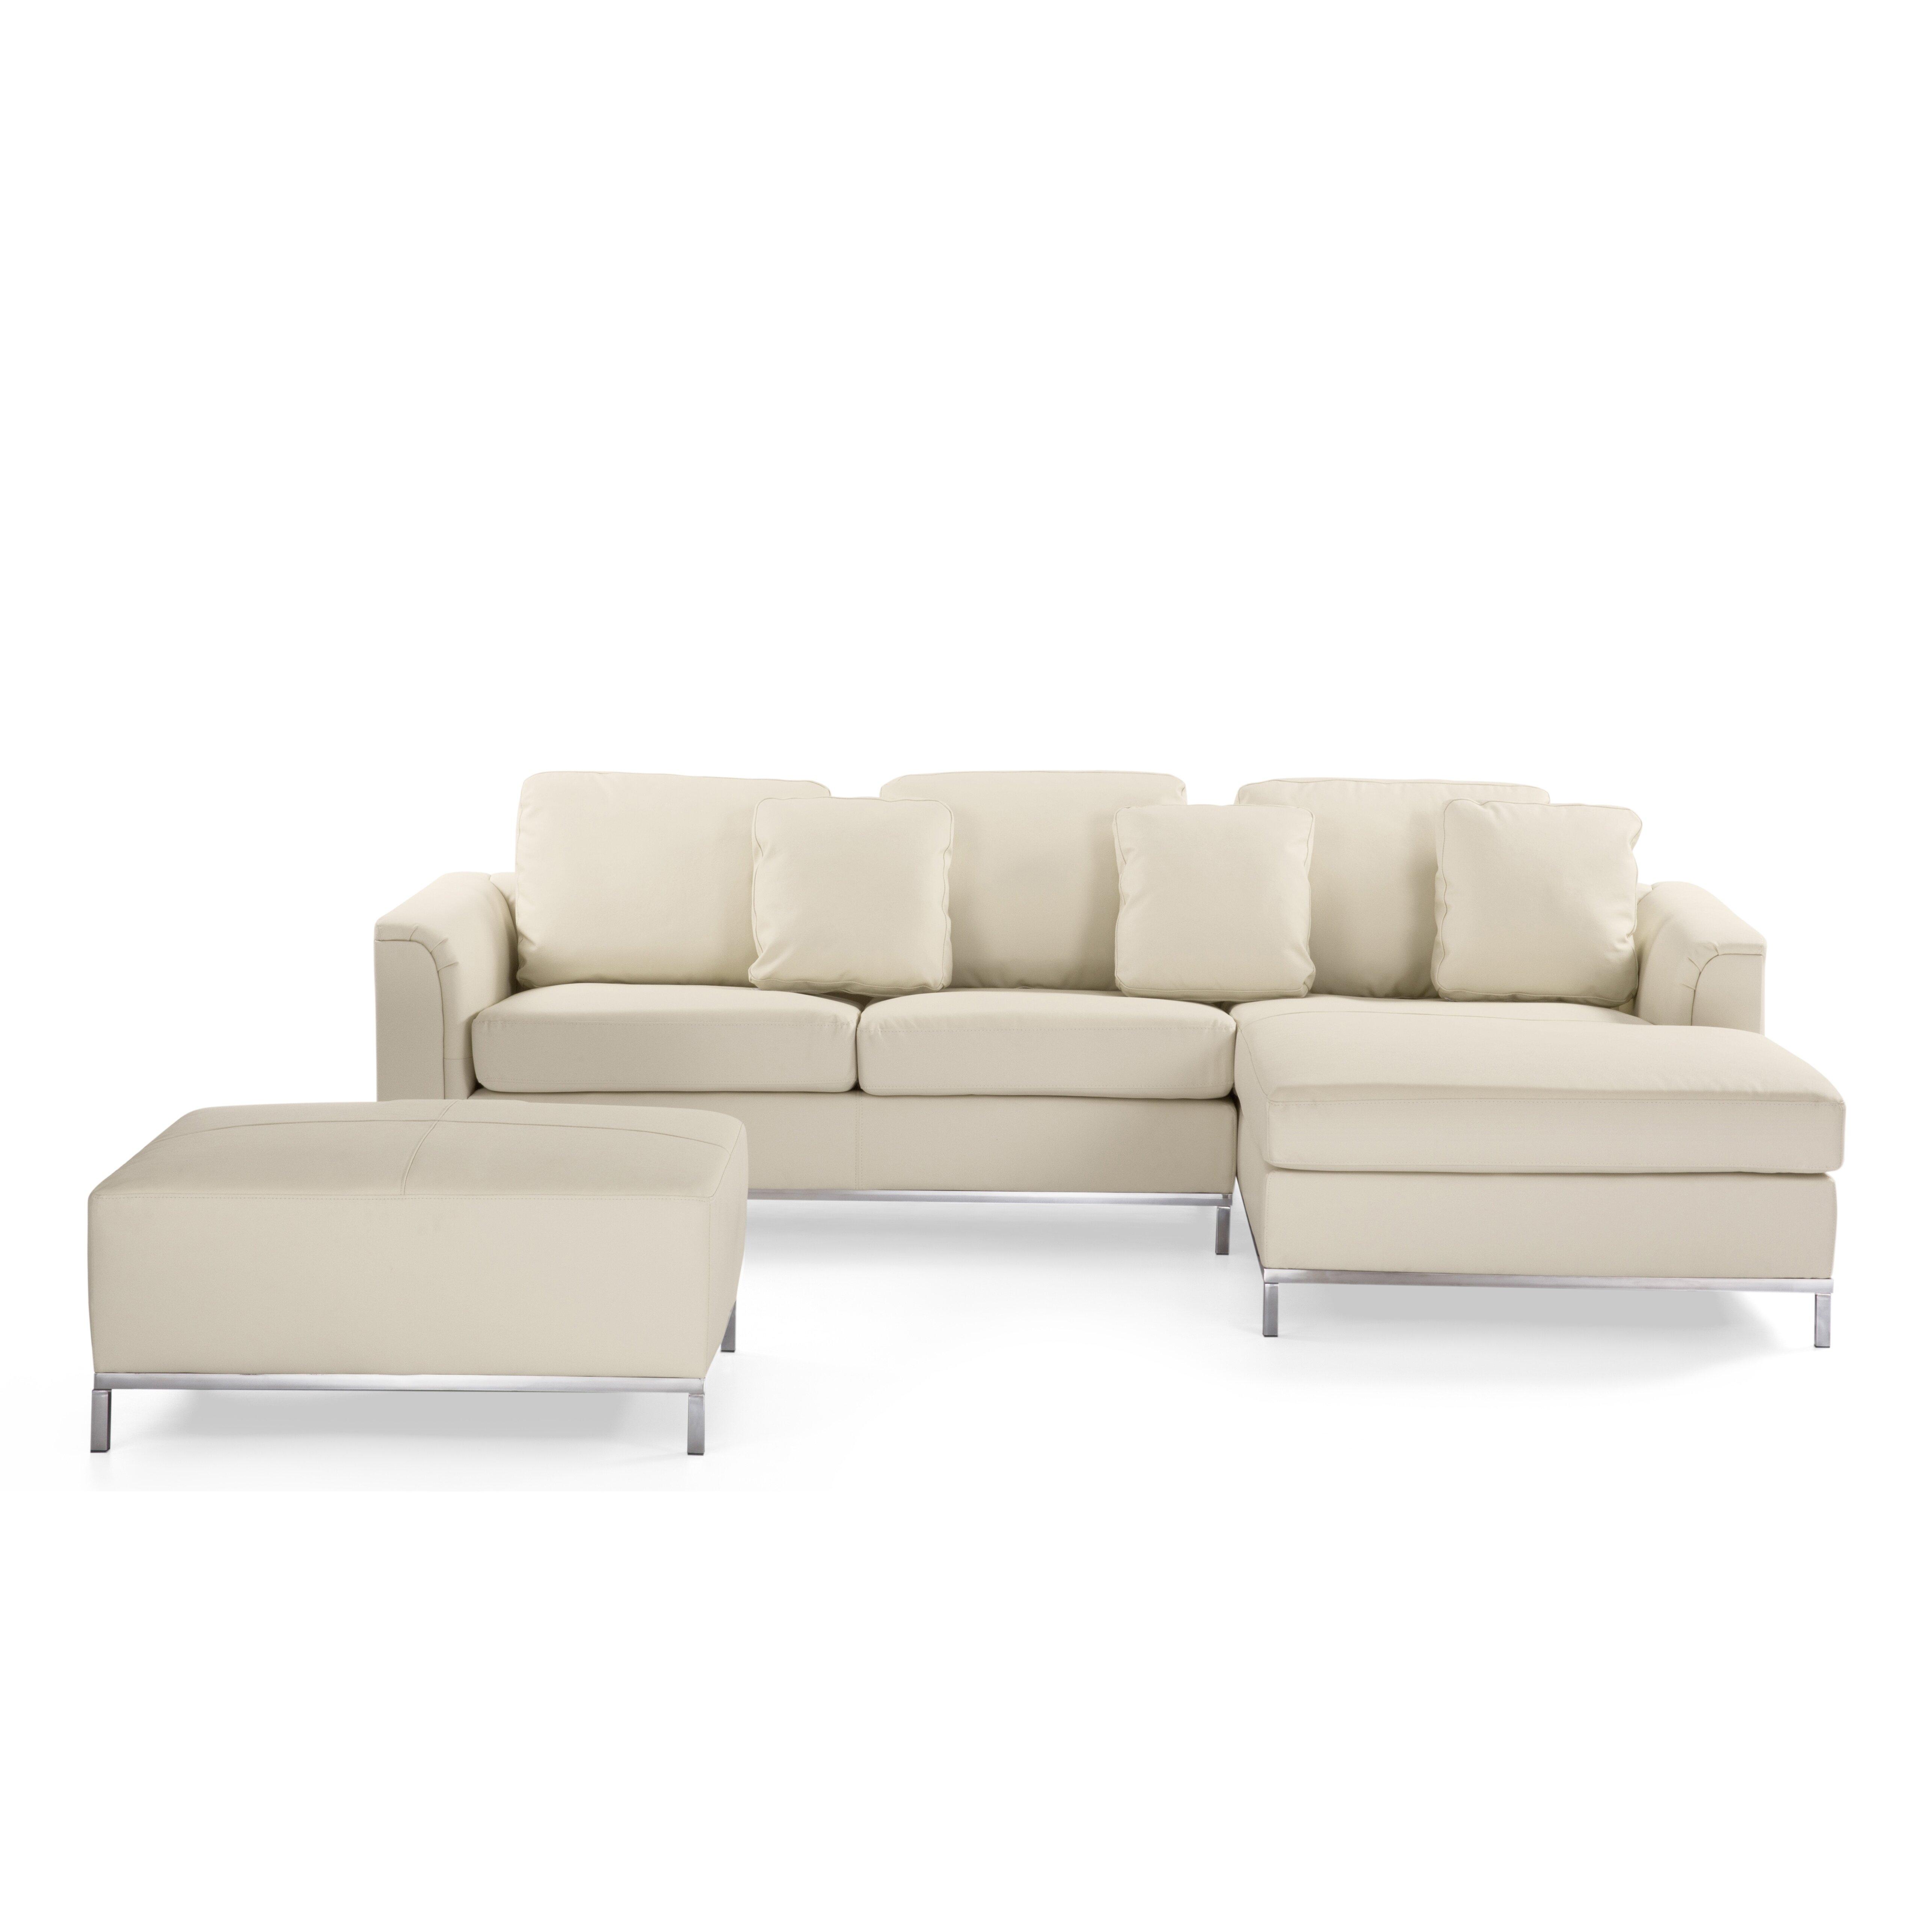 Leather Living Room Sets Beliani Oslo 3 Piece Leather Living Room Set Reviews Wayfair